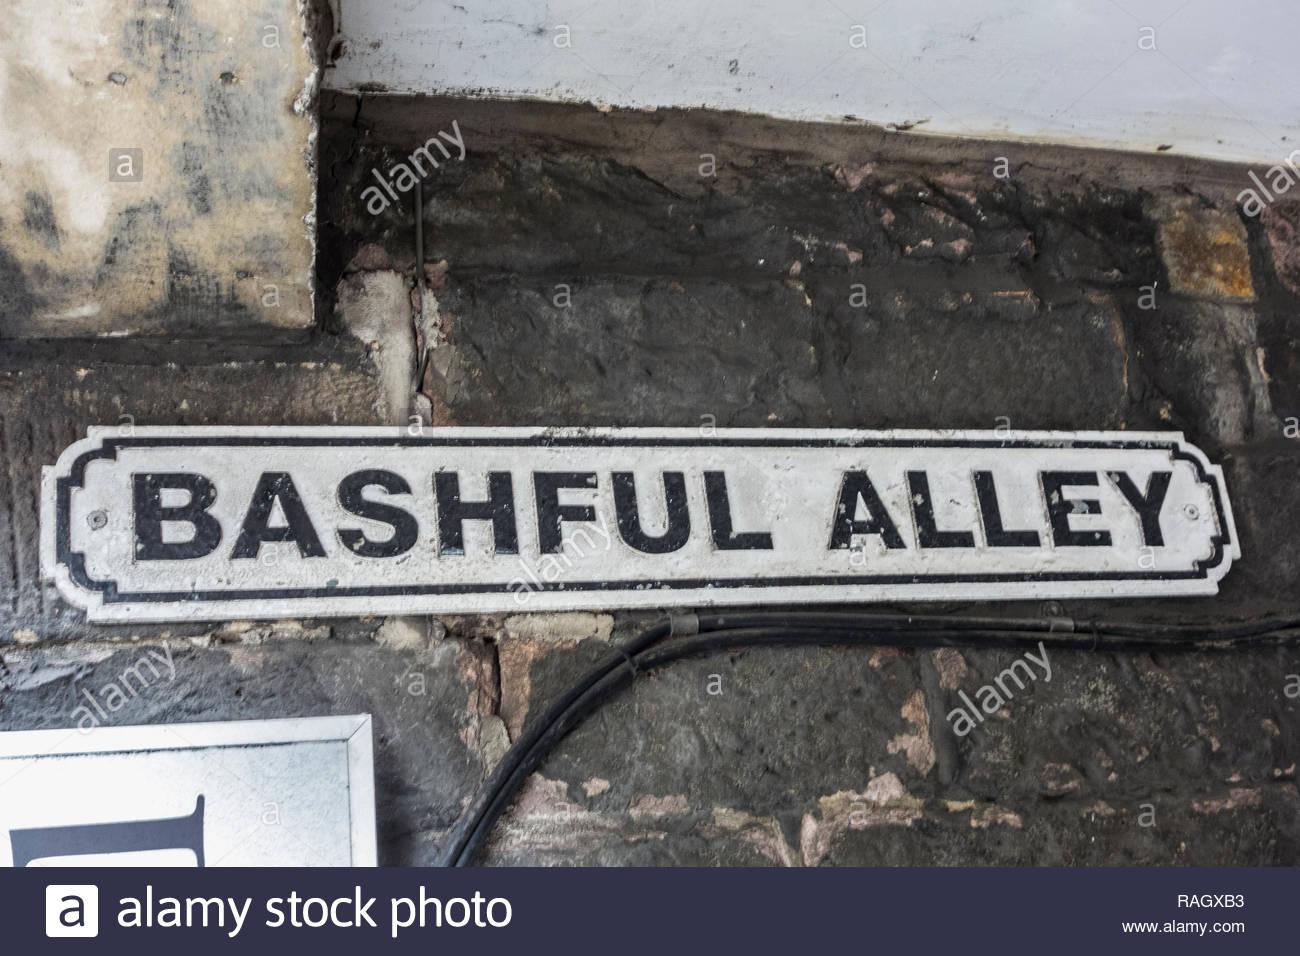 Un signo de la calle por un estrecho callejón, tímidas lane / callejón entre King Street y Market Street en Lancaster, Lancashire, Inglaterra, Reino Unido. Imagen De Stock